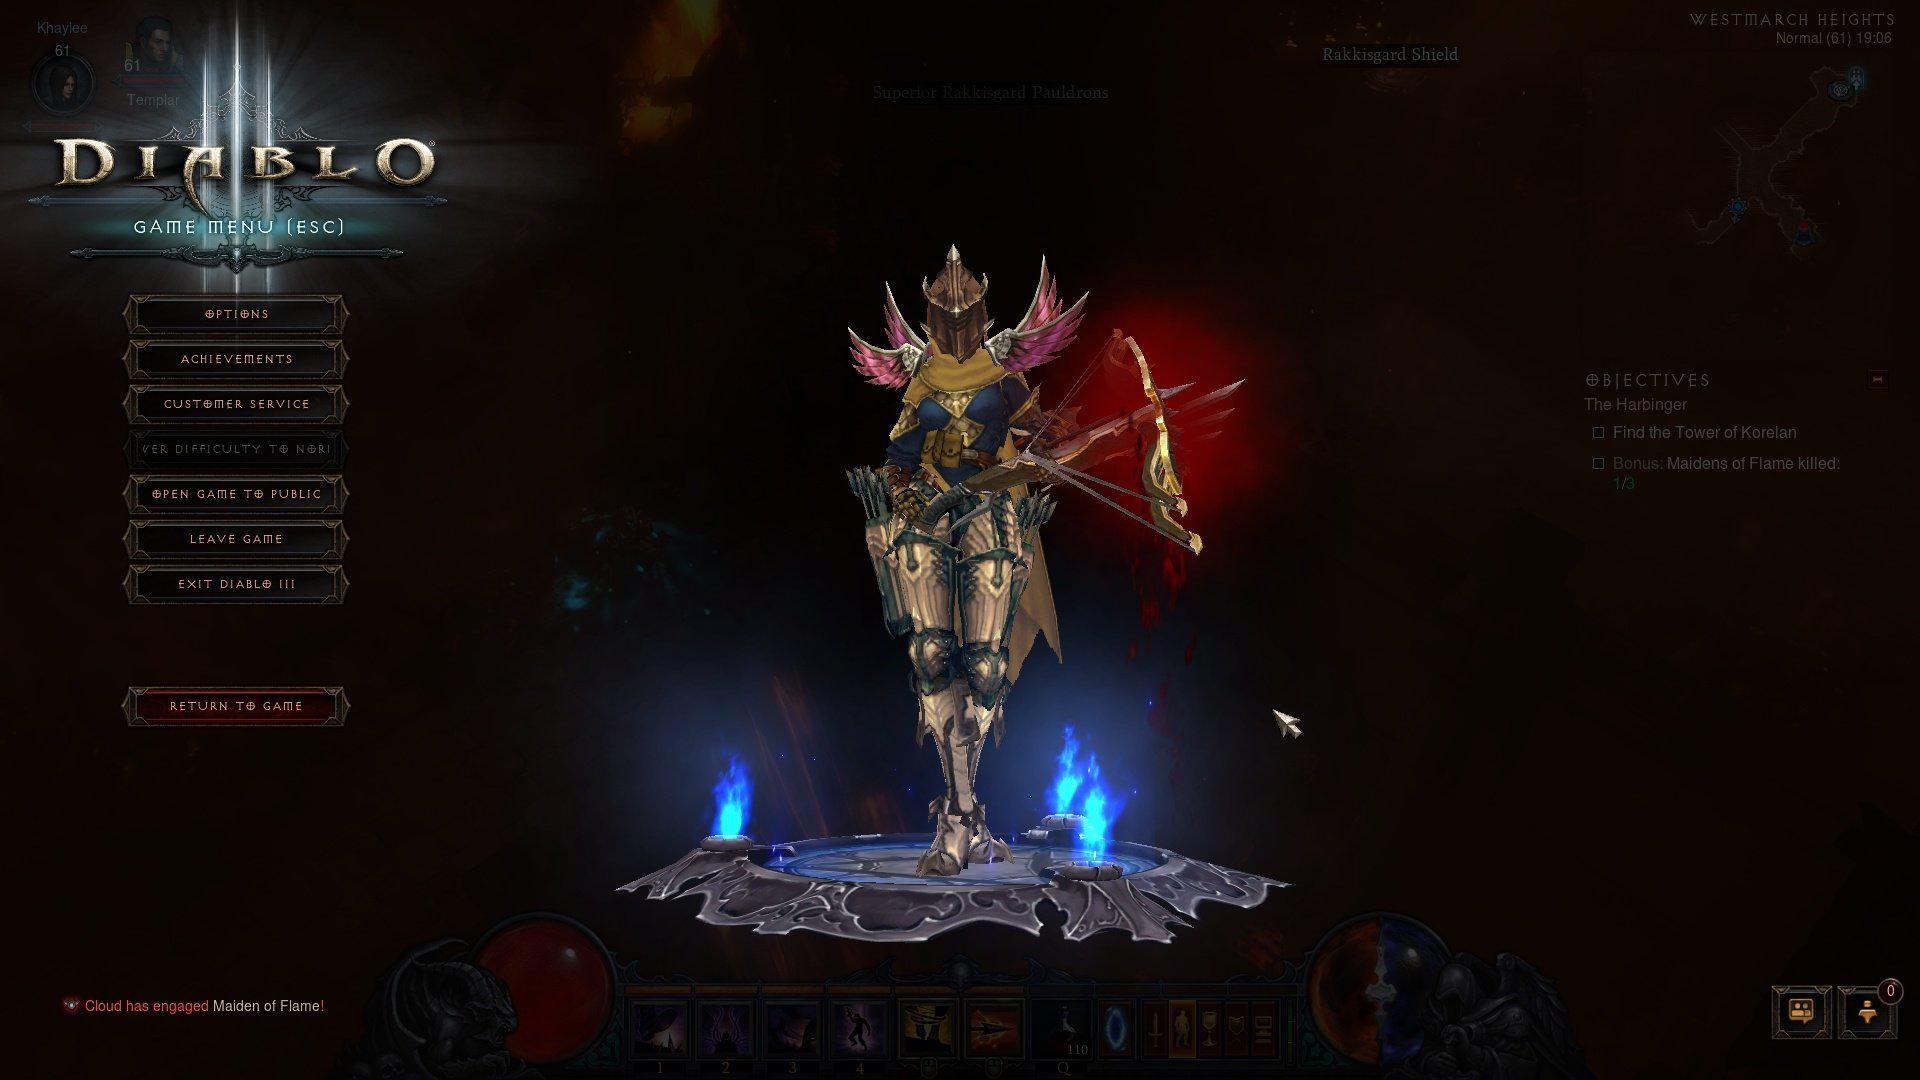 21 9 Pubg Wallpaper New Diablo Iii Reaper Of Souls Screens Gt Gamersbook